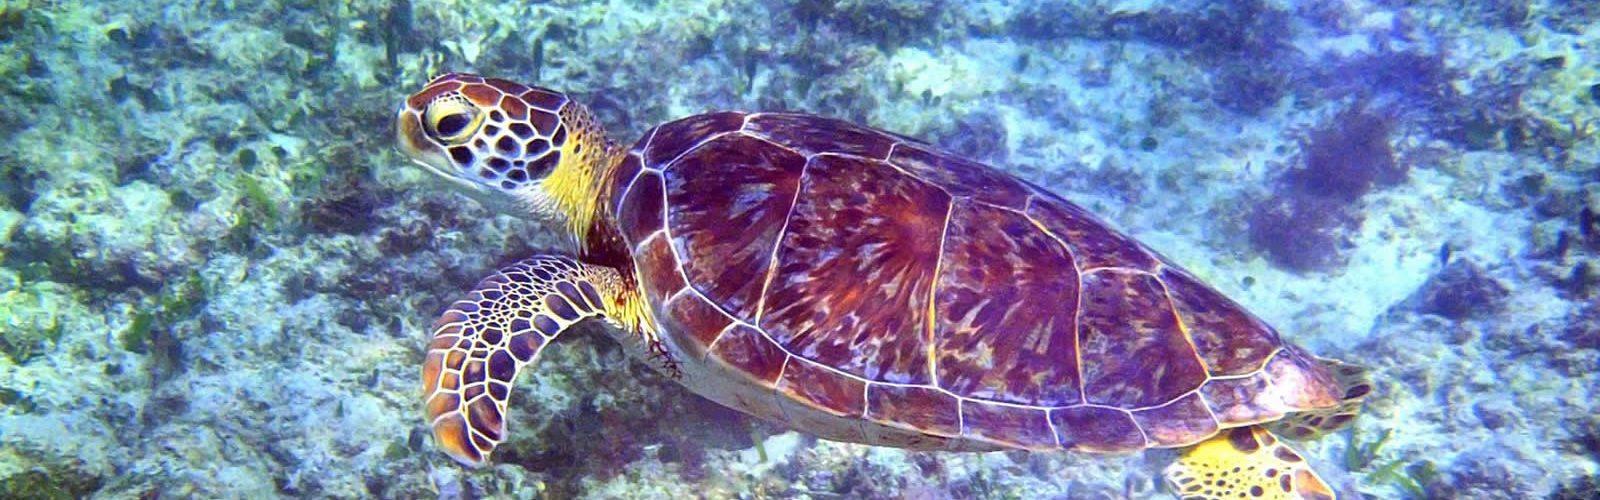 ponte-protection-tortues-plage-turtle-walk-floride-une